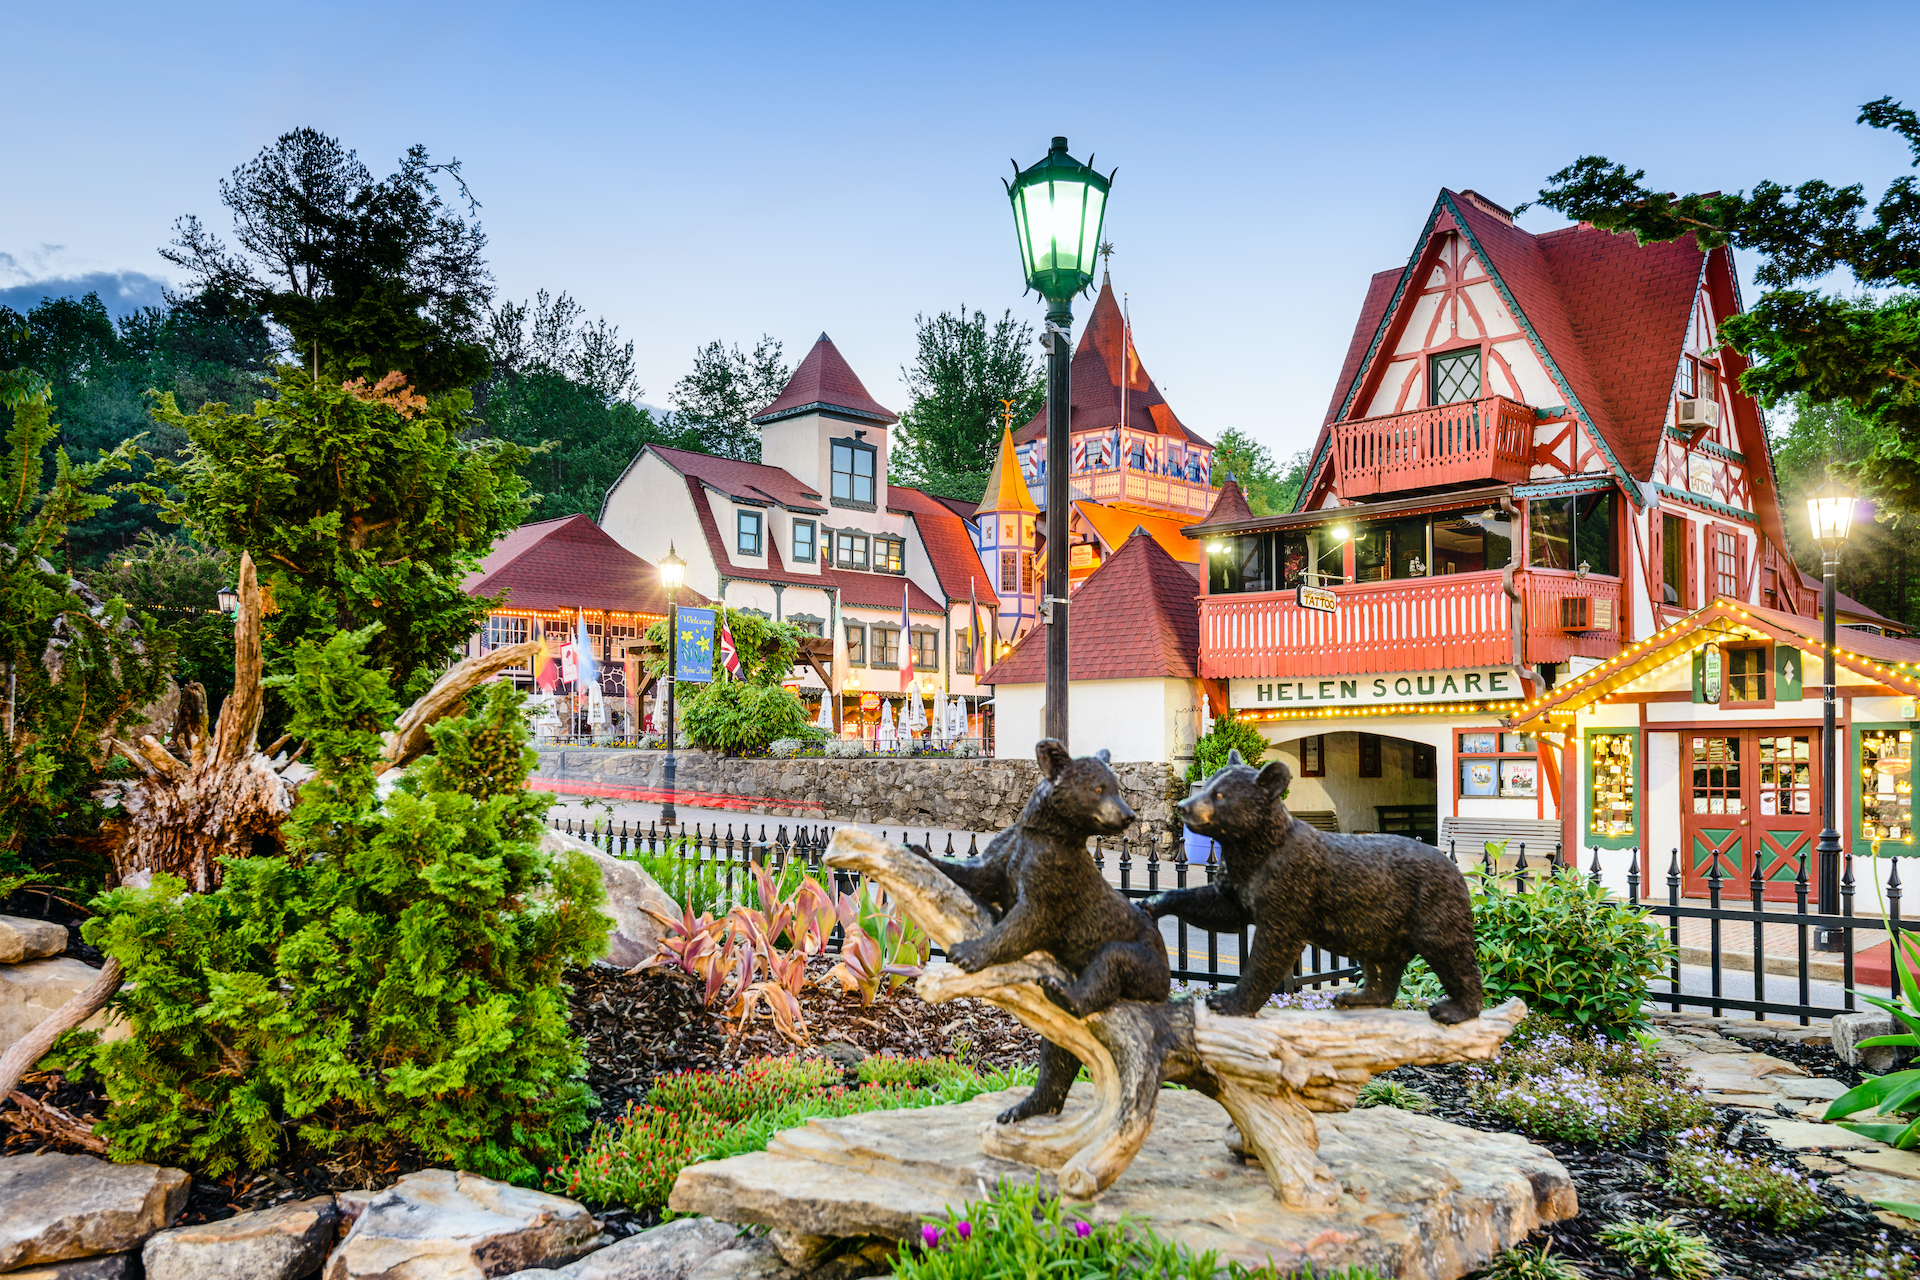 Bavarian-inspired buildings of Helen, Georgia